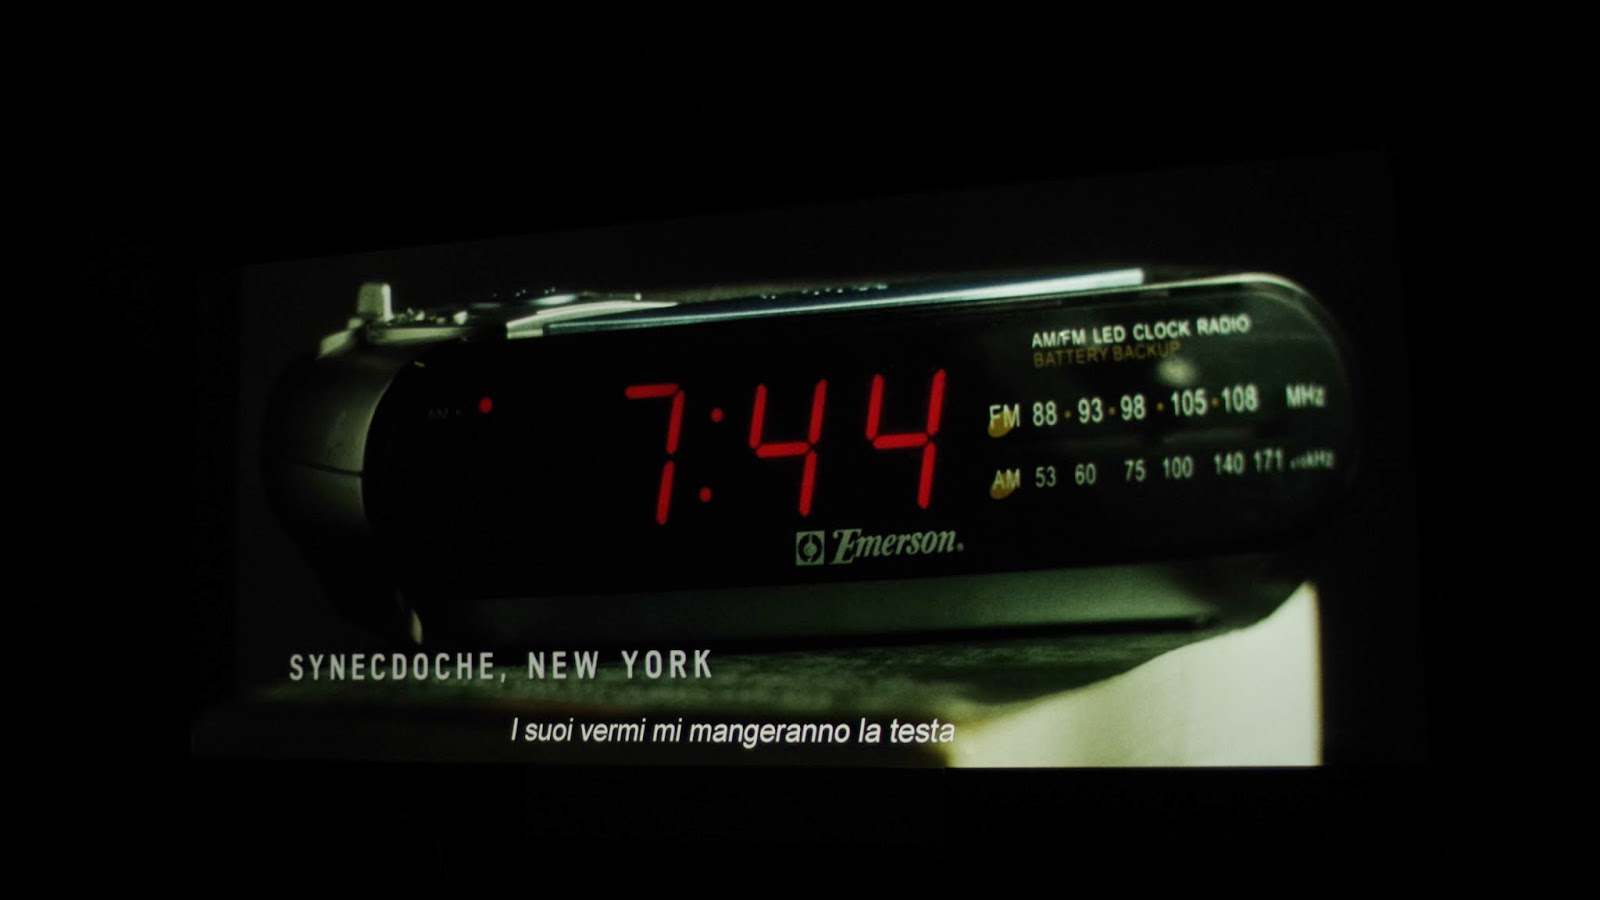 screenshot synnecdoche, new york ONIRONAUTAIDIOSINCRATICO